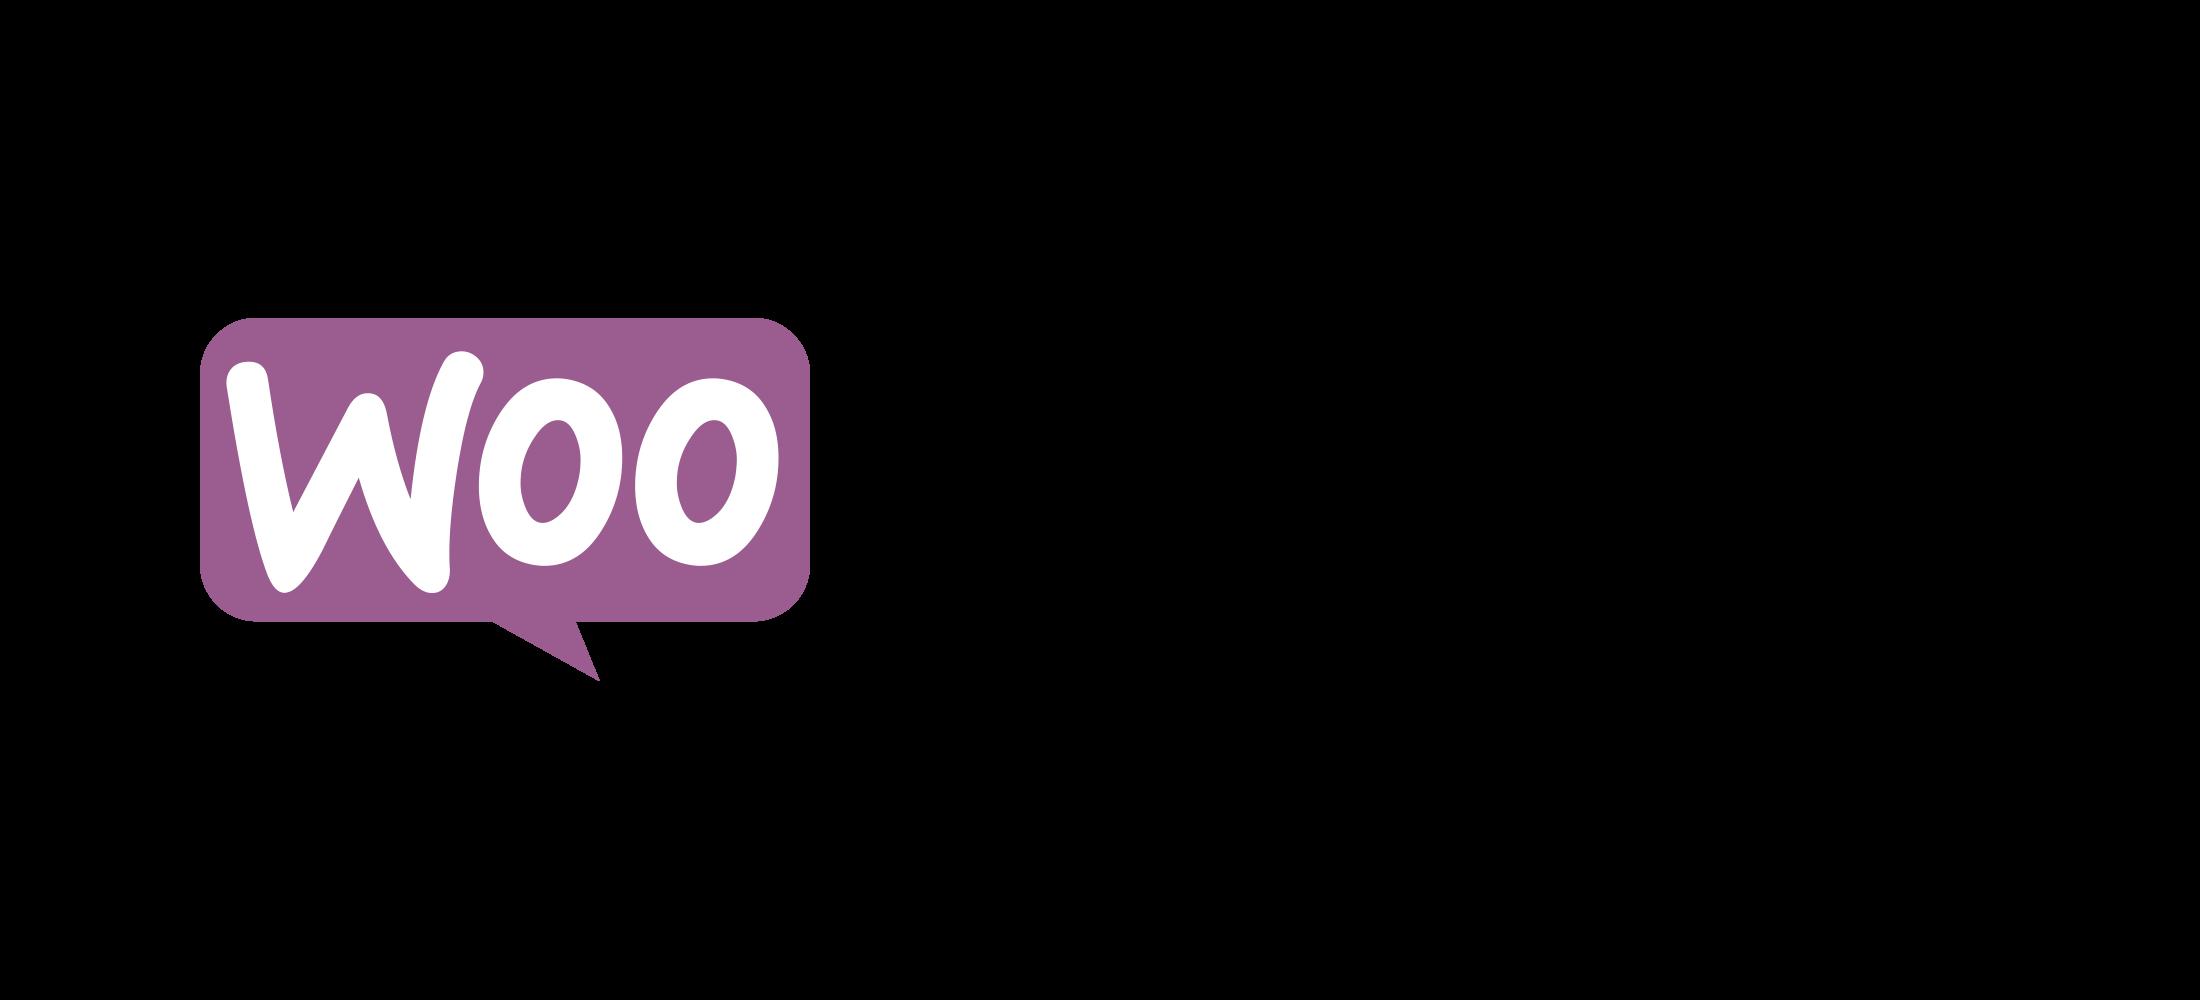 29 The Best Free WooCommerce Optimized WordPress Themes 2019